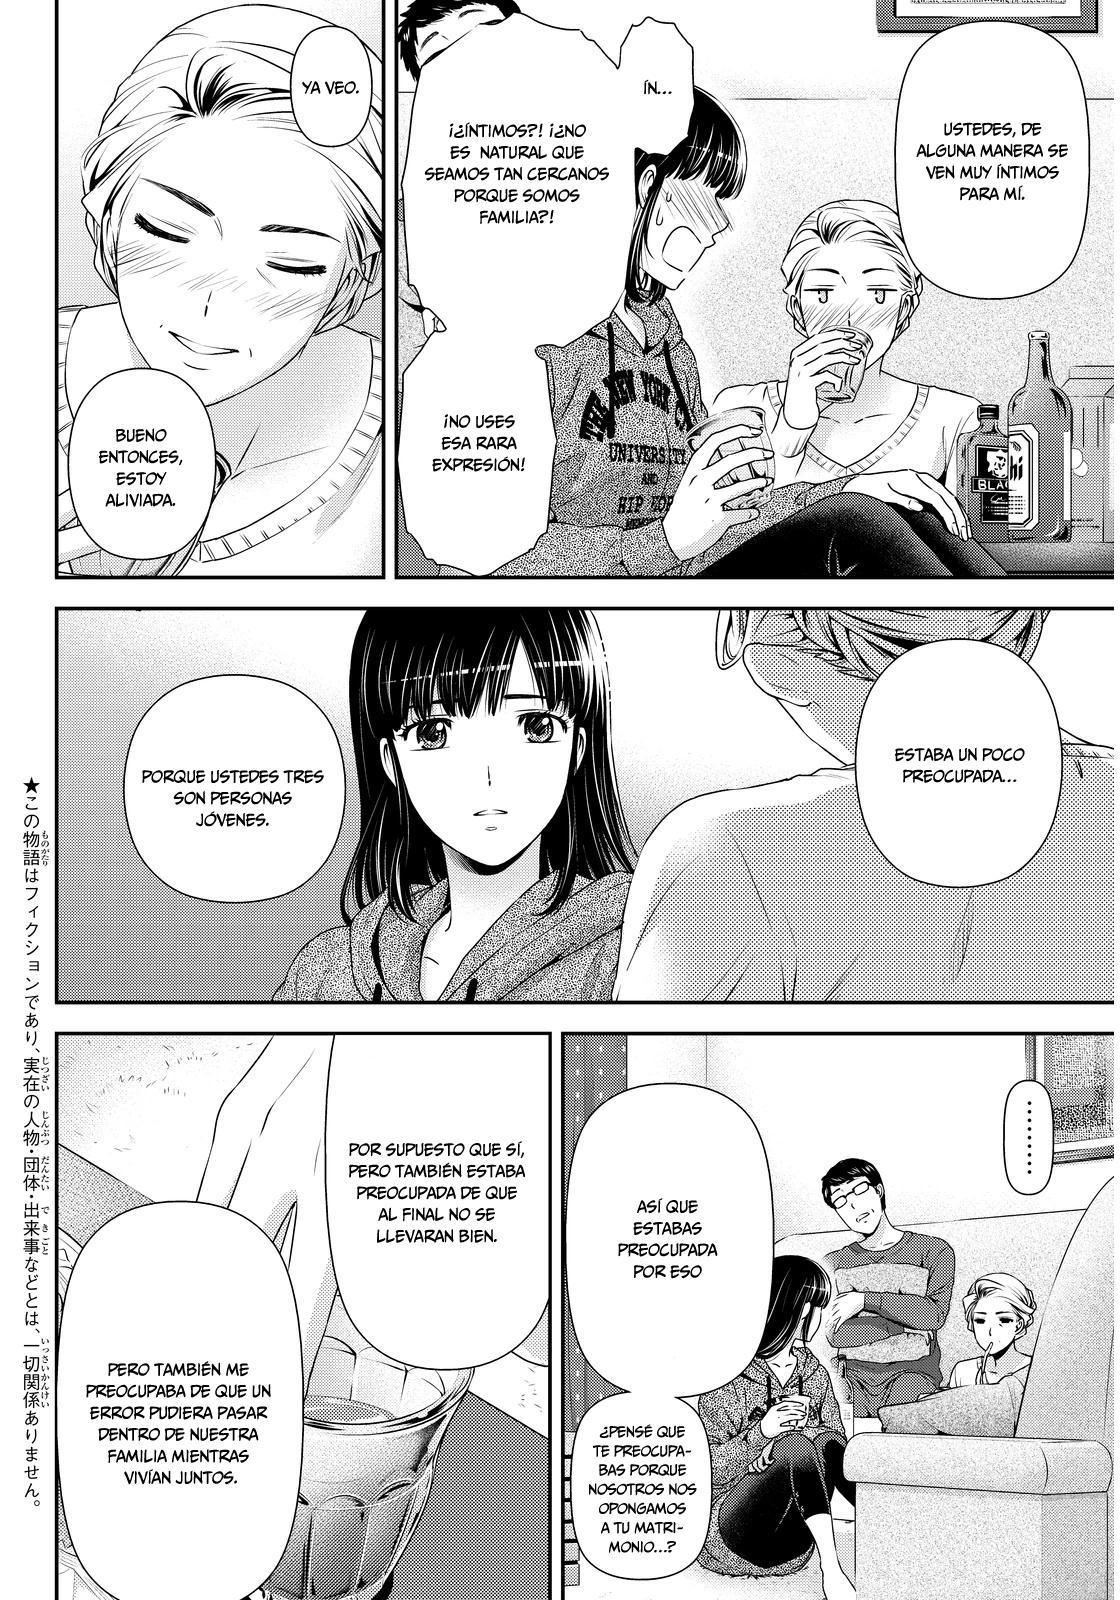 https://c5.ninemanga.com/es_manga/9/14345/418231/0108c35749d6c8cdae8dde56d5f3640c.jpg Page 3